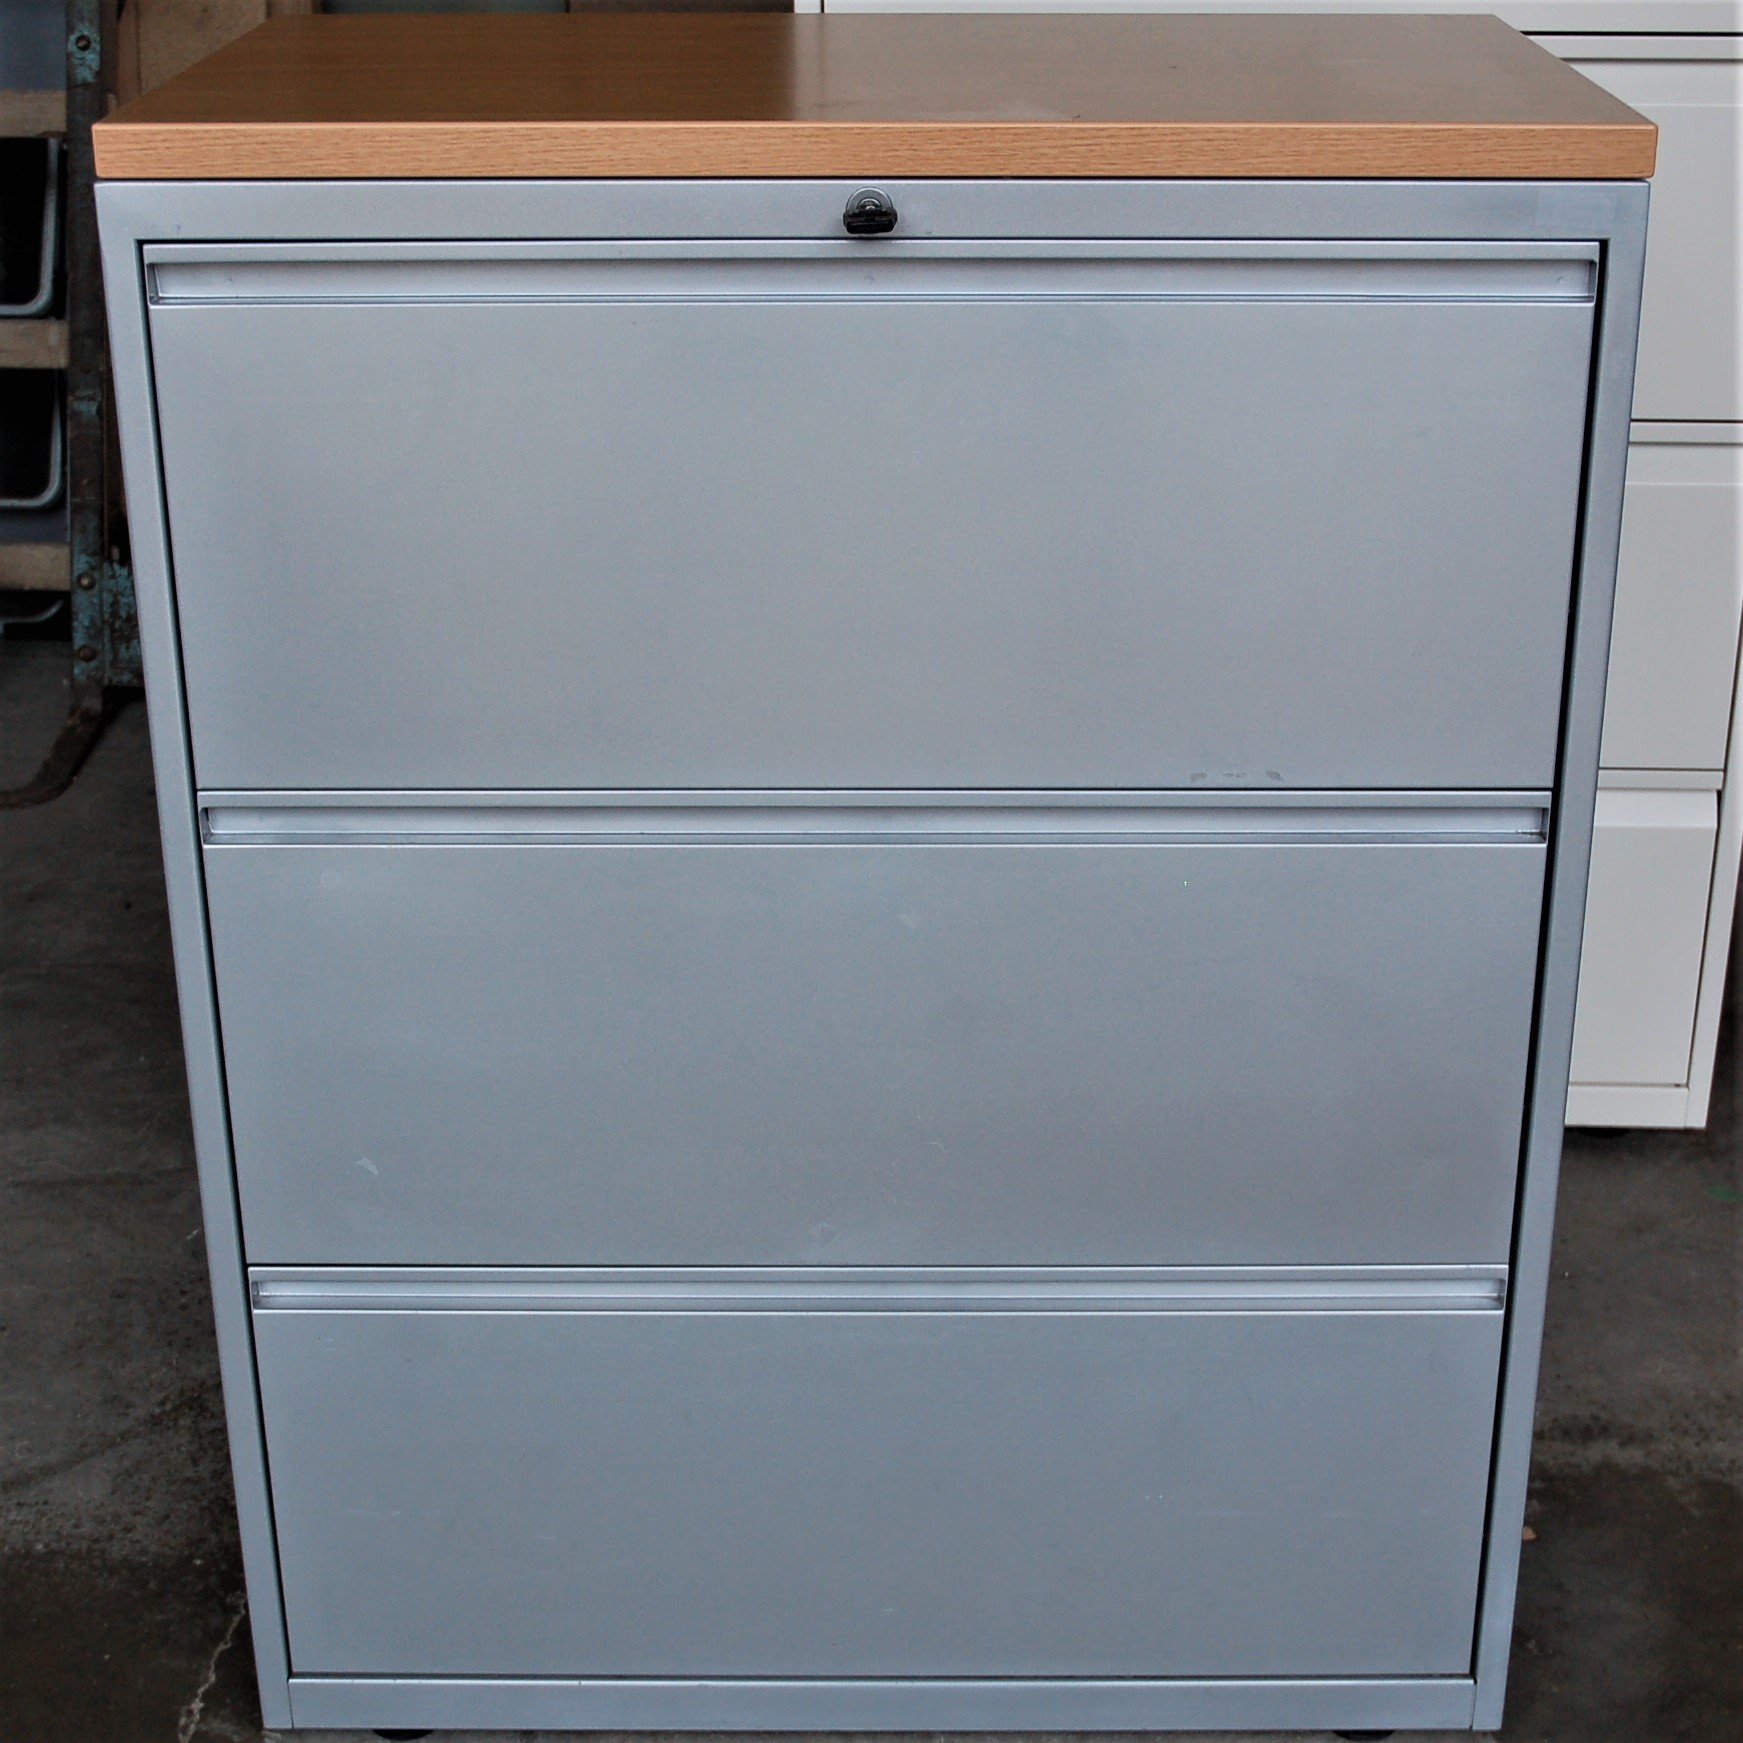 3dwr Lateral Filing Cabinet Silver Oak 6061